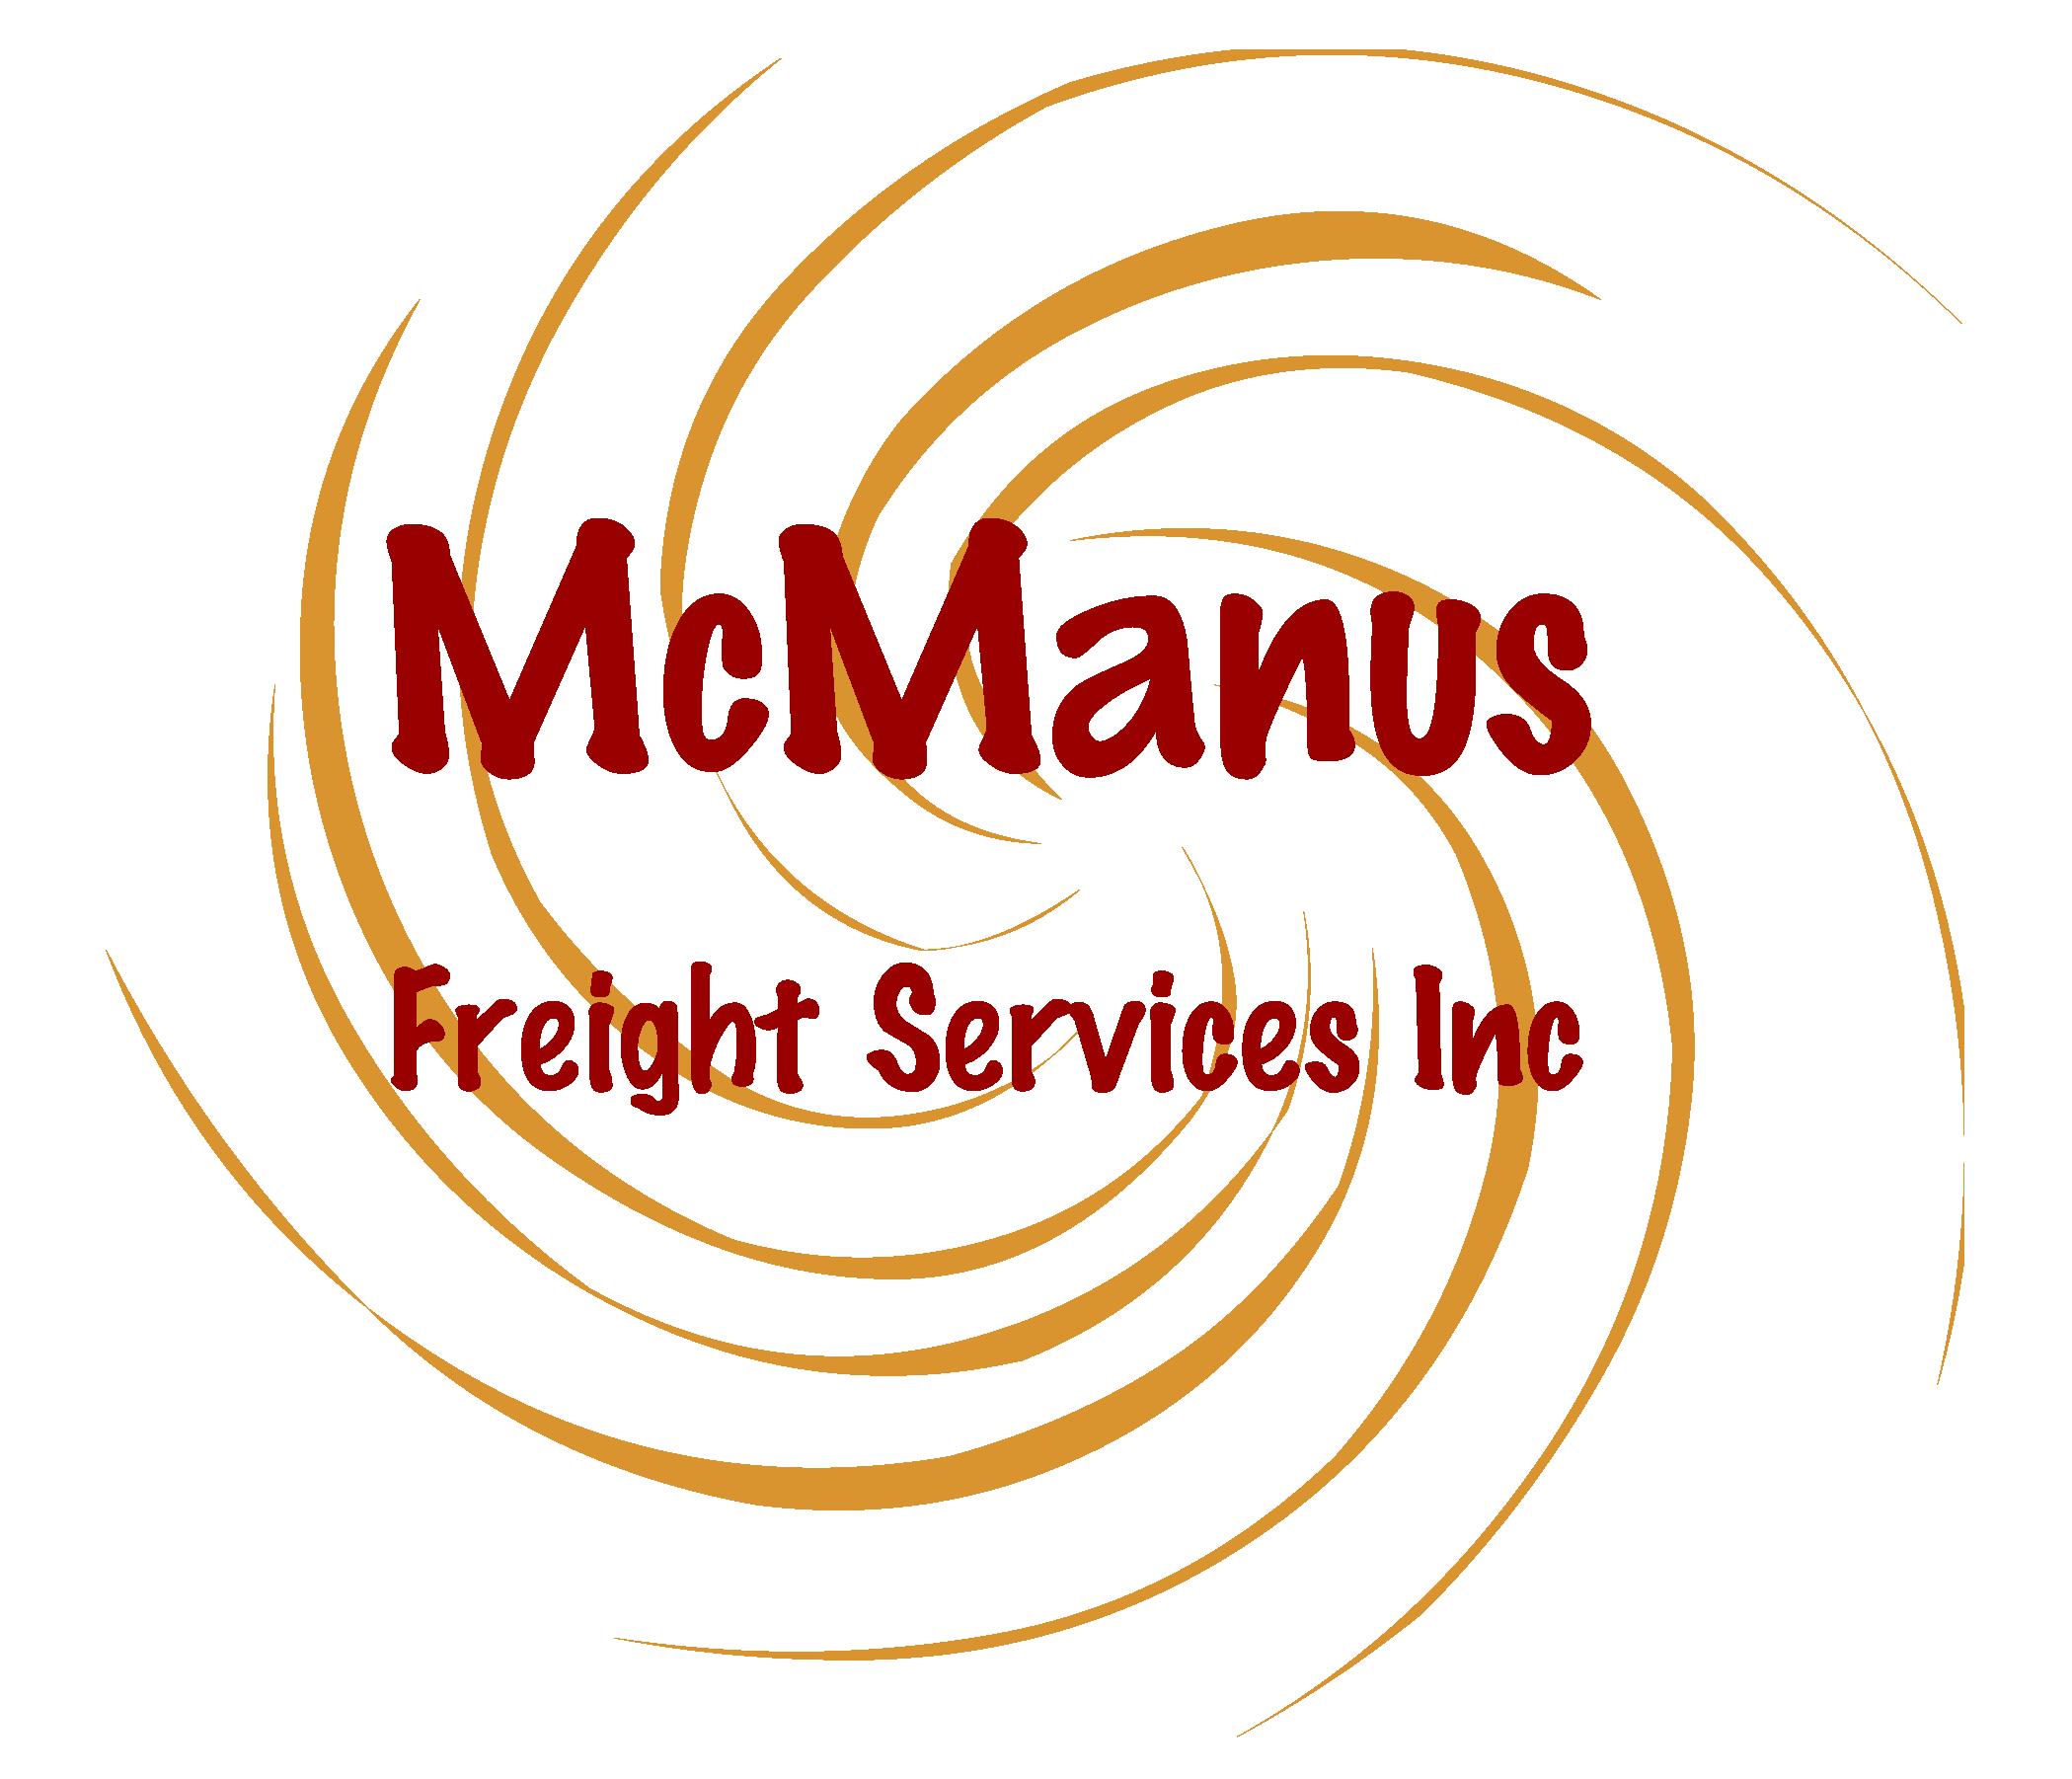 McManus Freight Services Inc